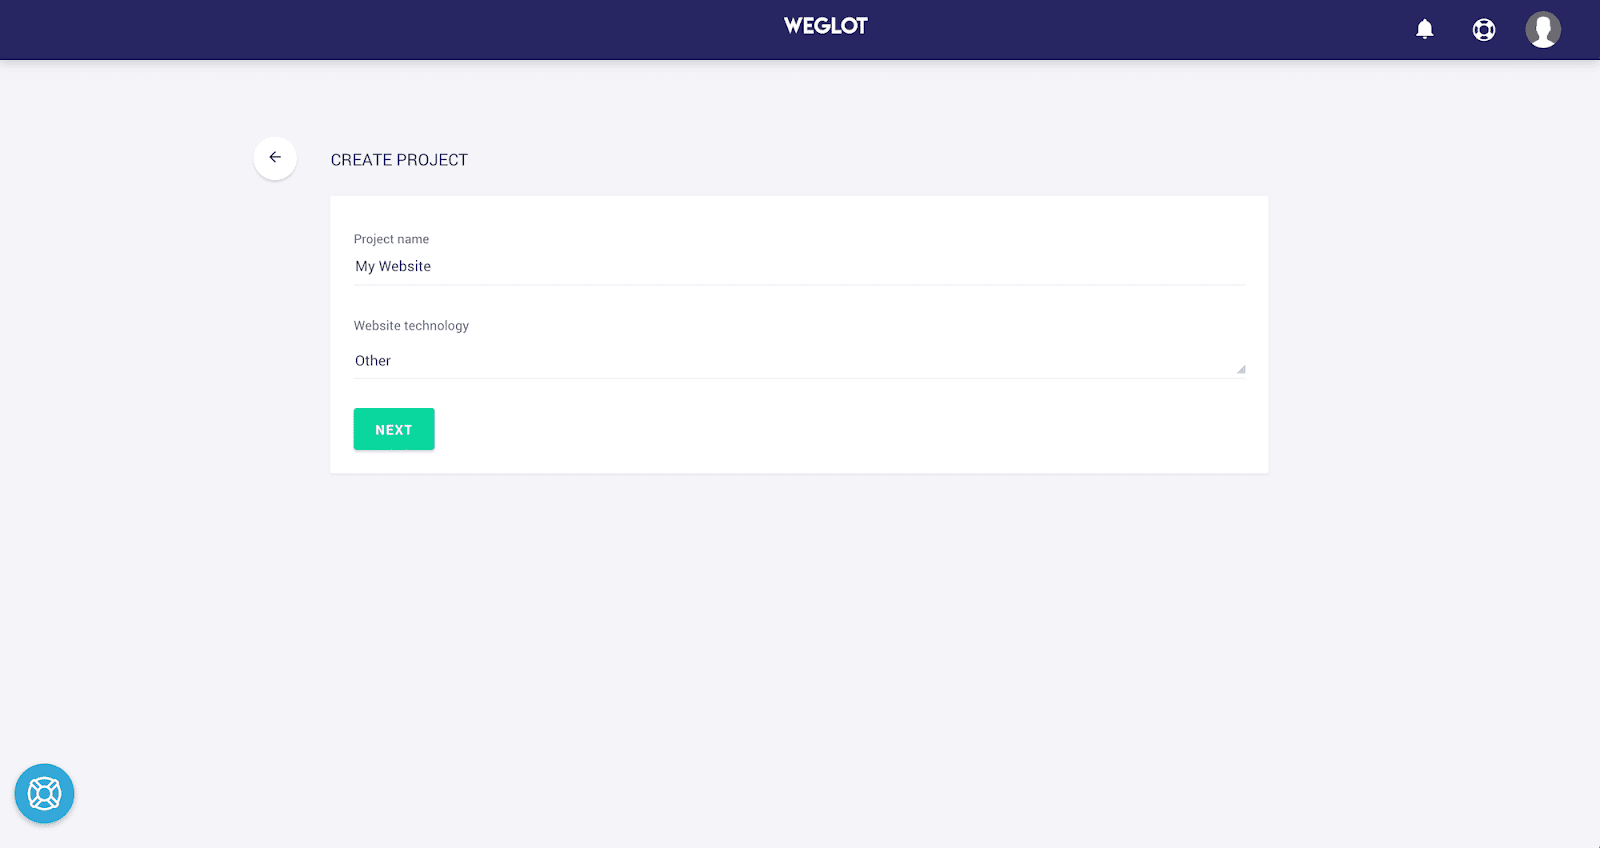 weglot project creation page